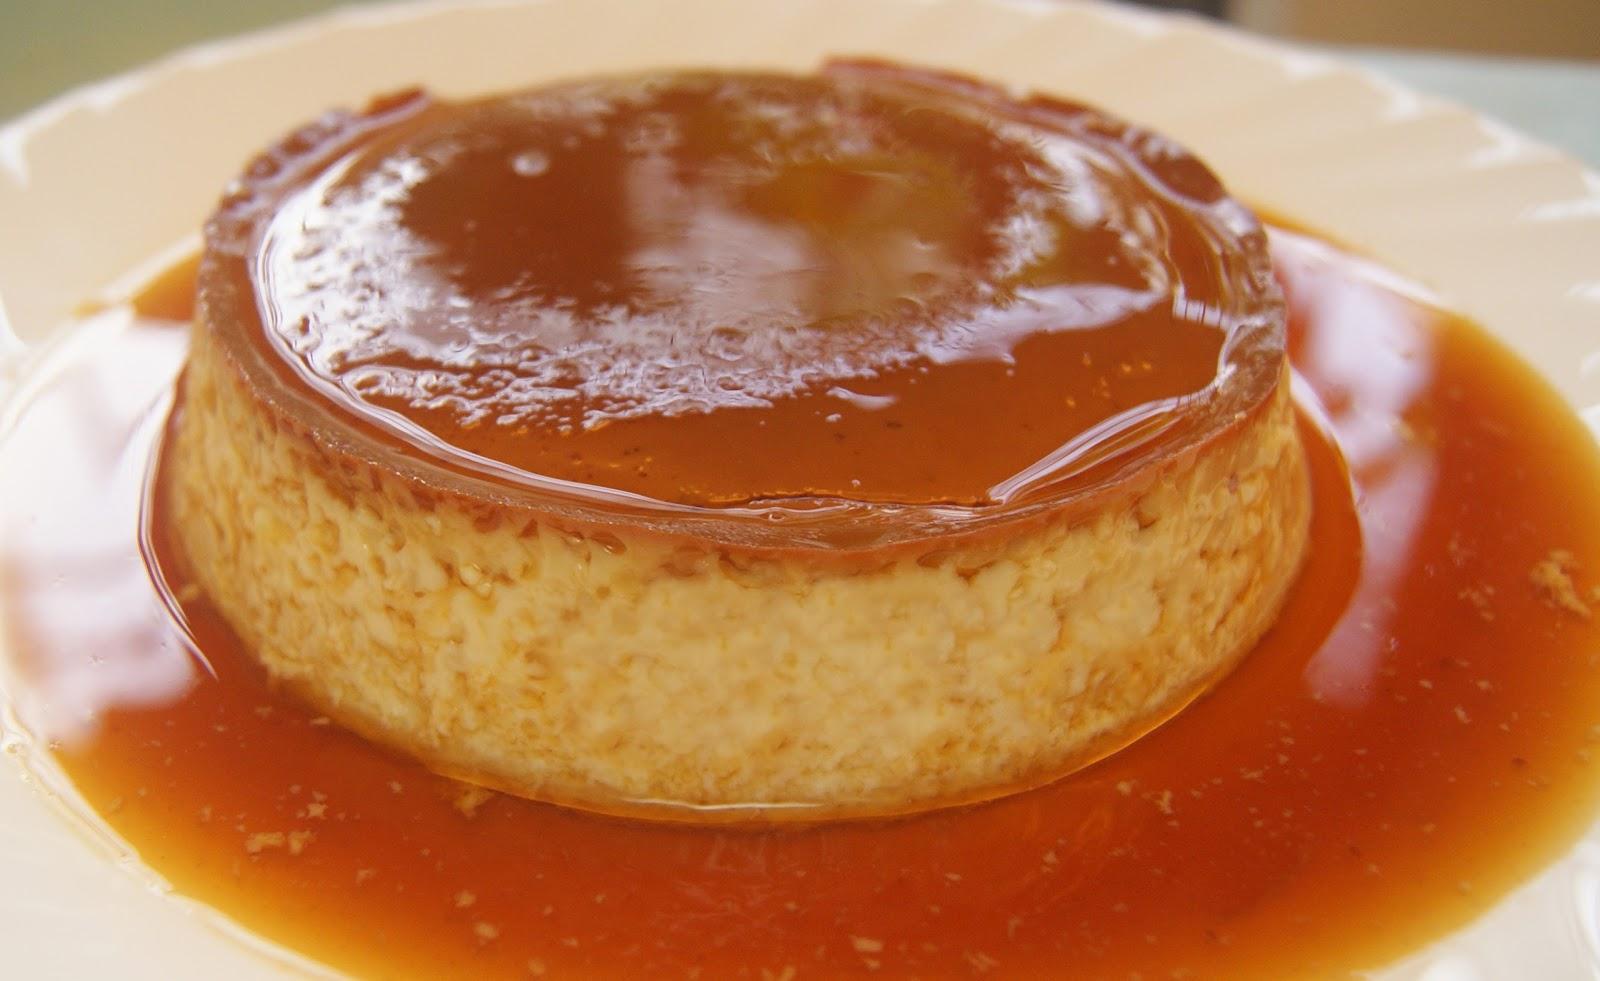 ... stylist, in Mumbai: Crème Caramel/ Caramel Custard/Caramel Pudding